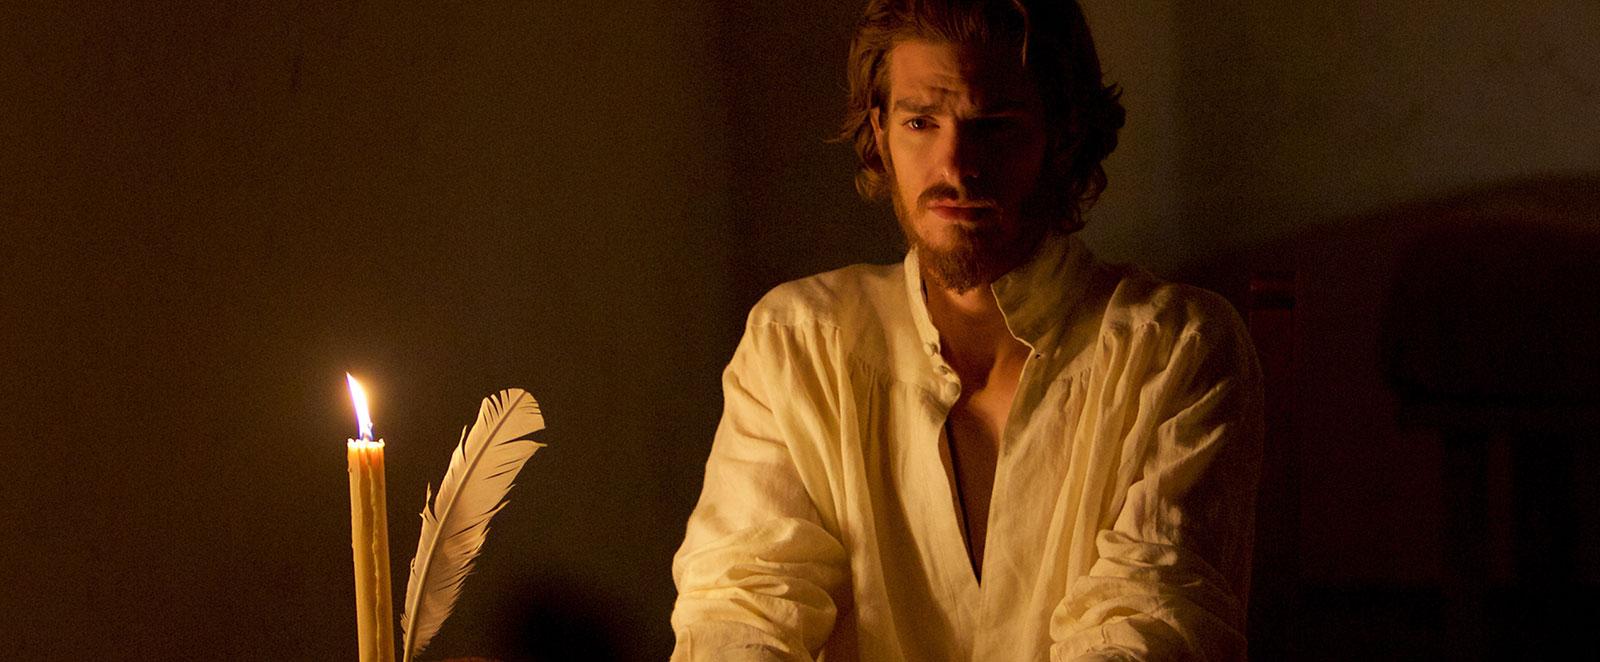 Jesuit films examine spiritual struggles